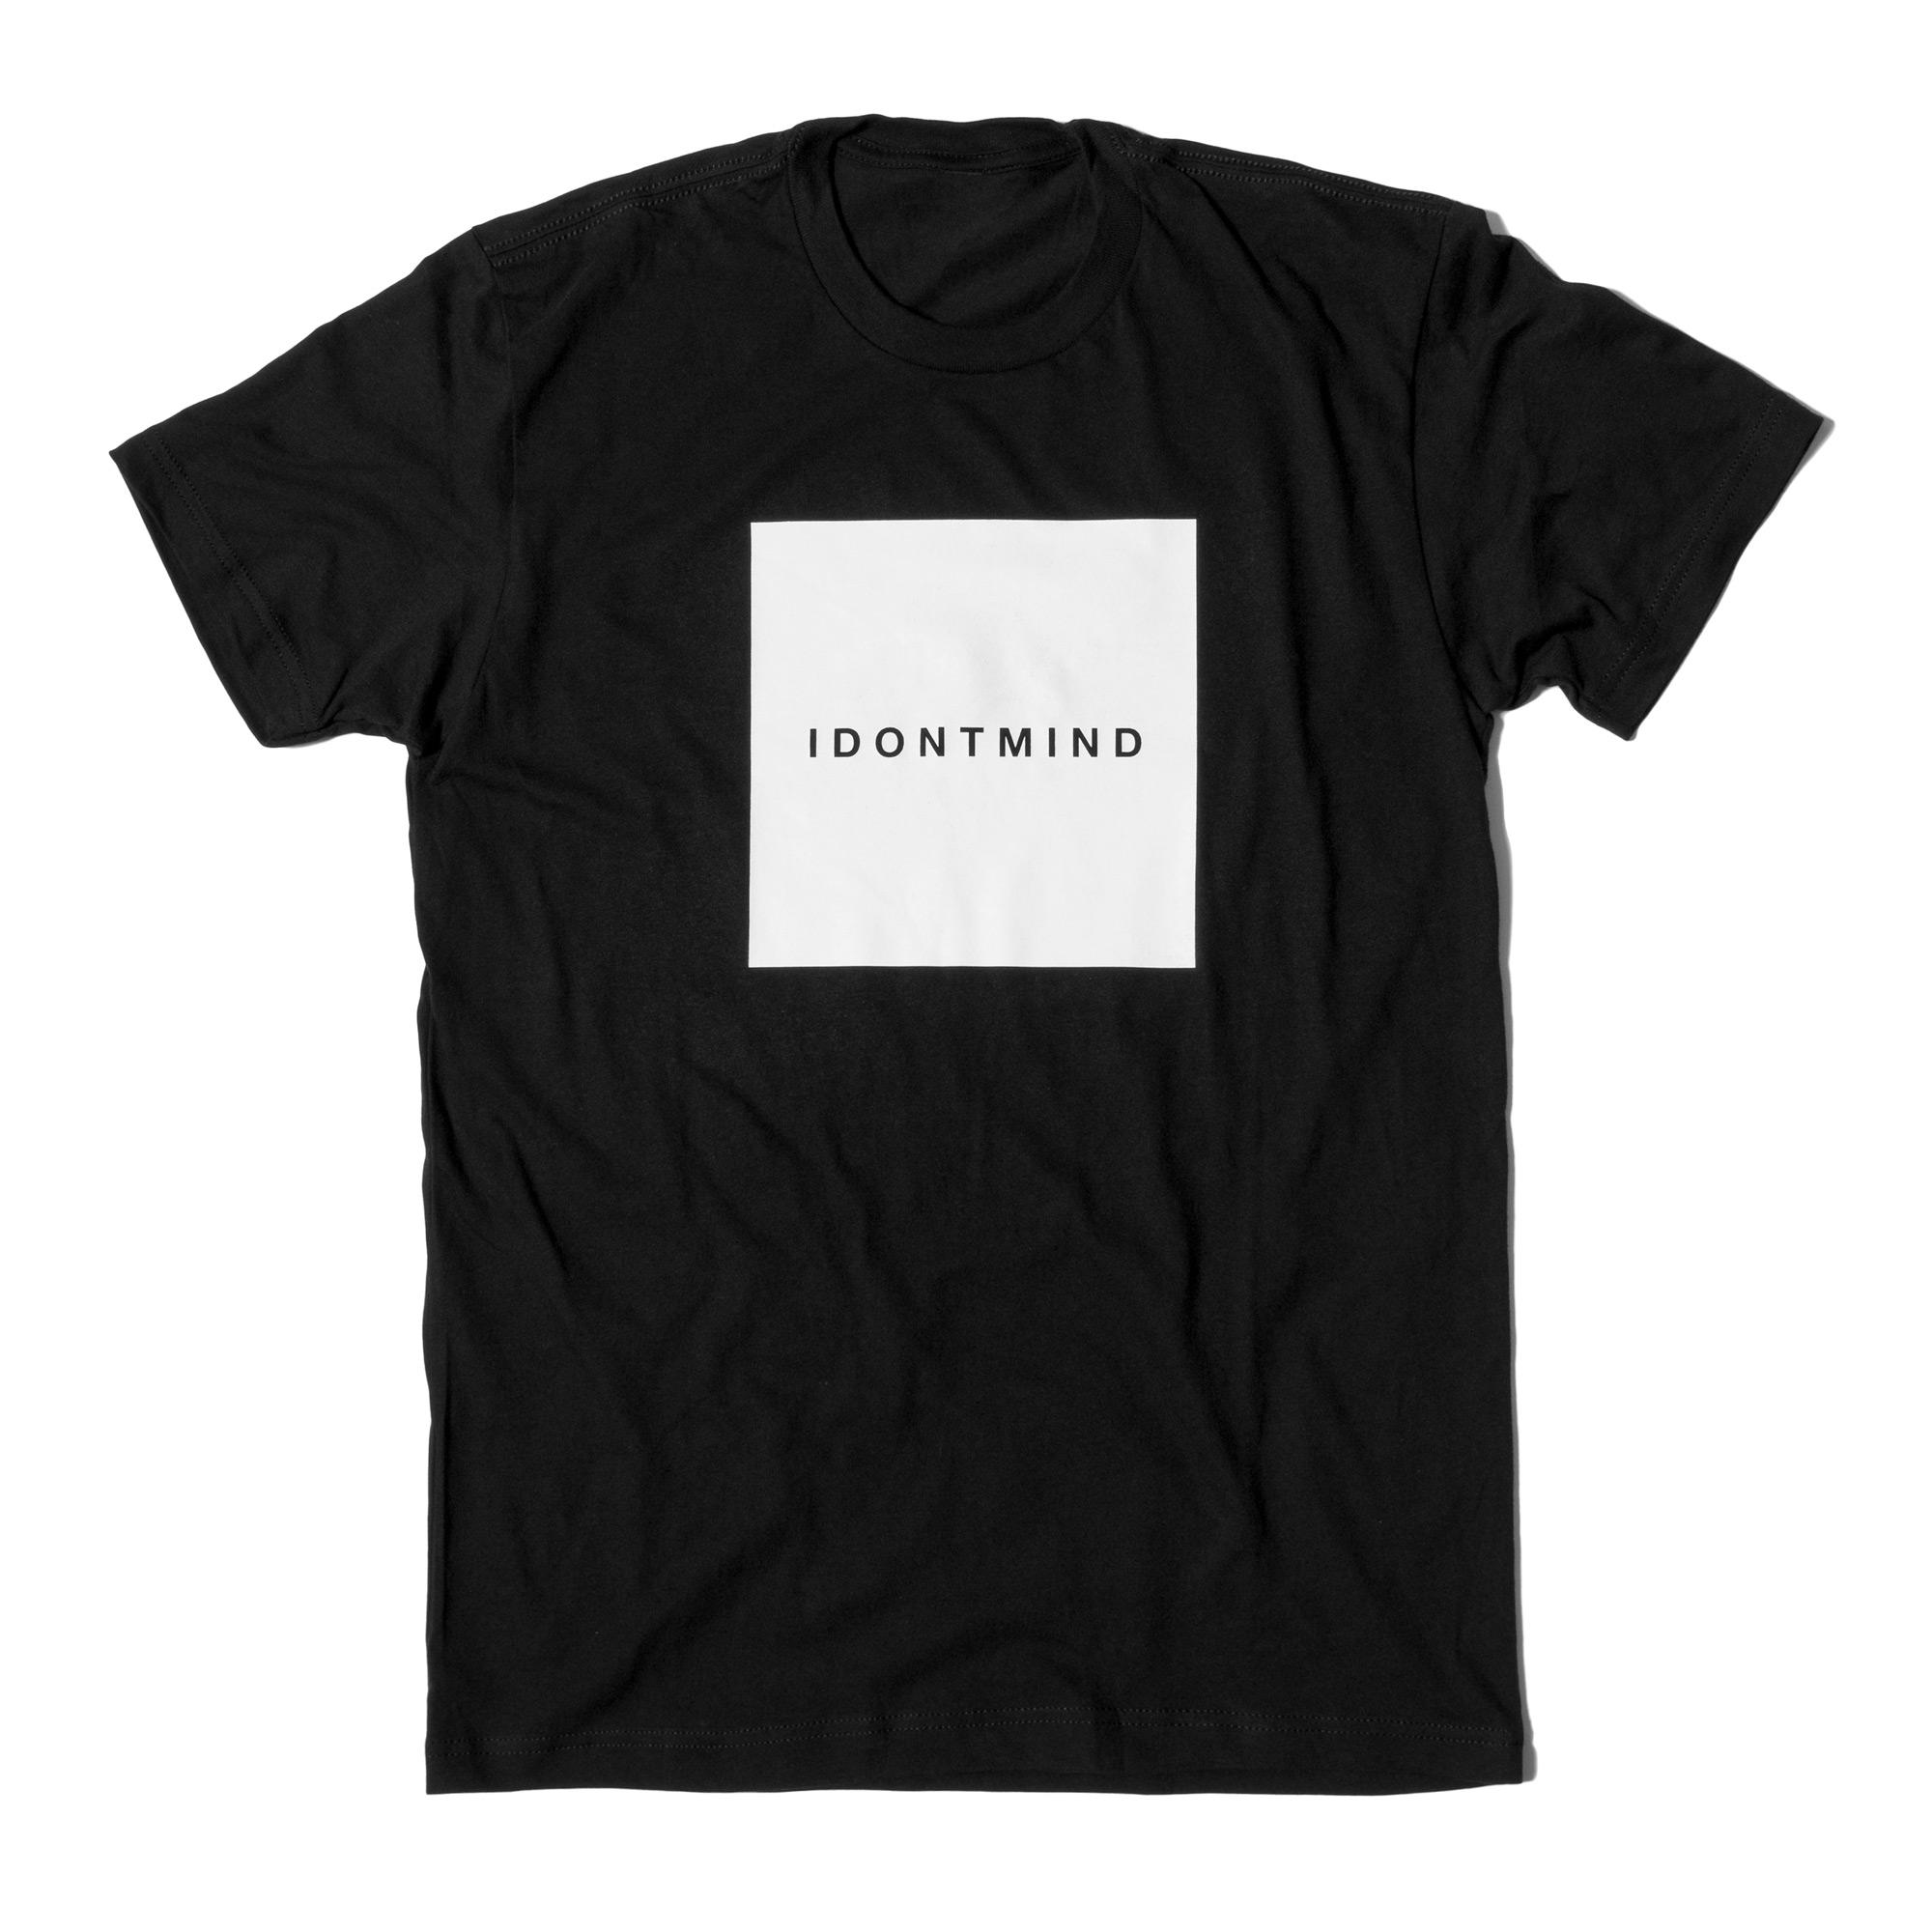 IDONTMIND-Tee-Black.jpg